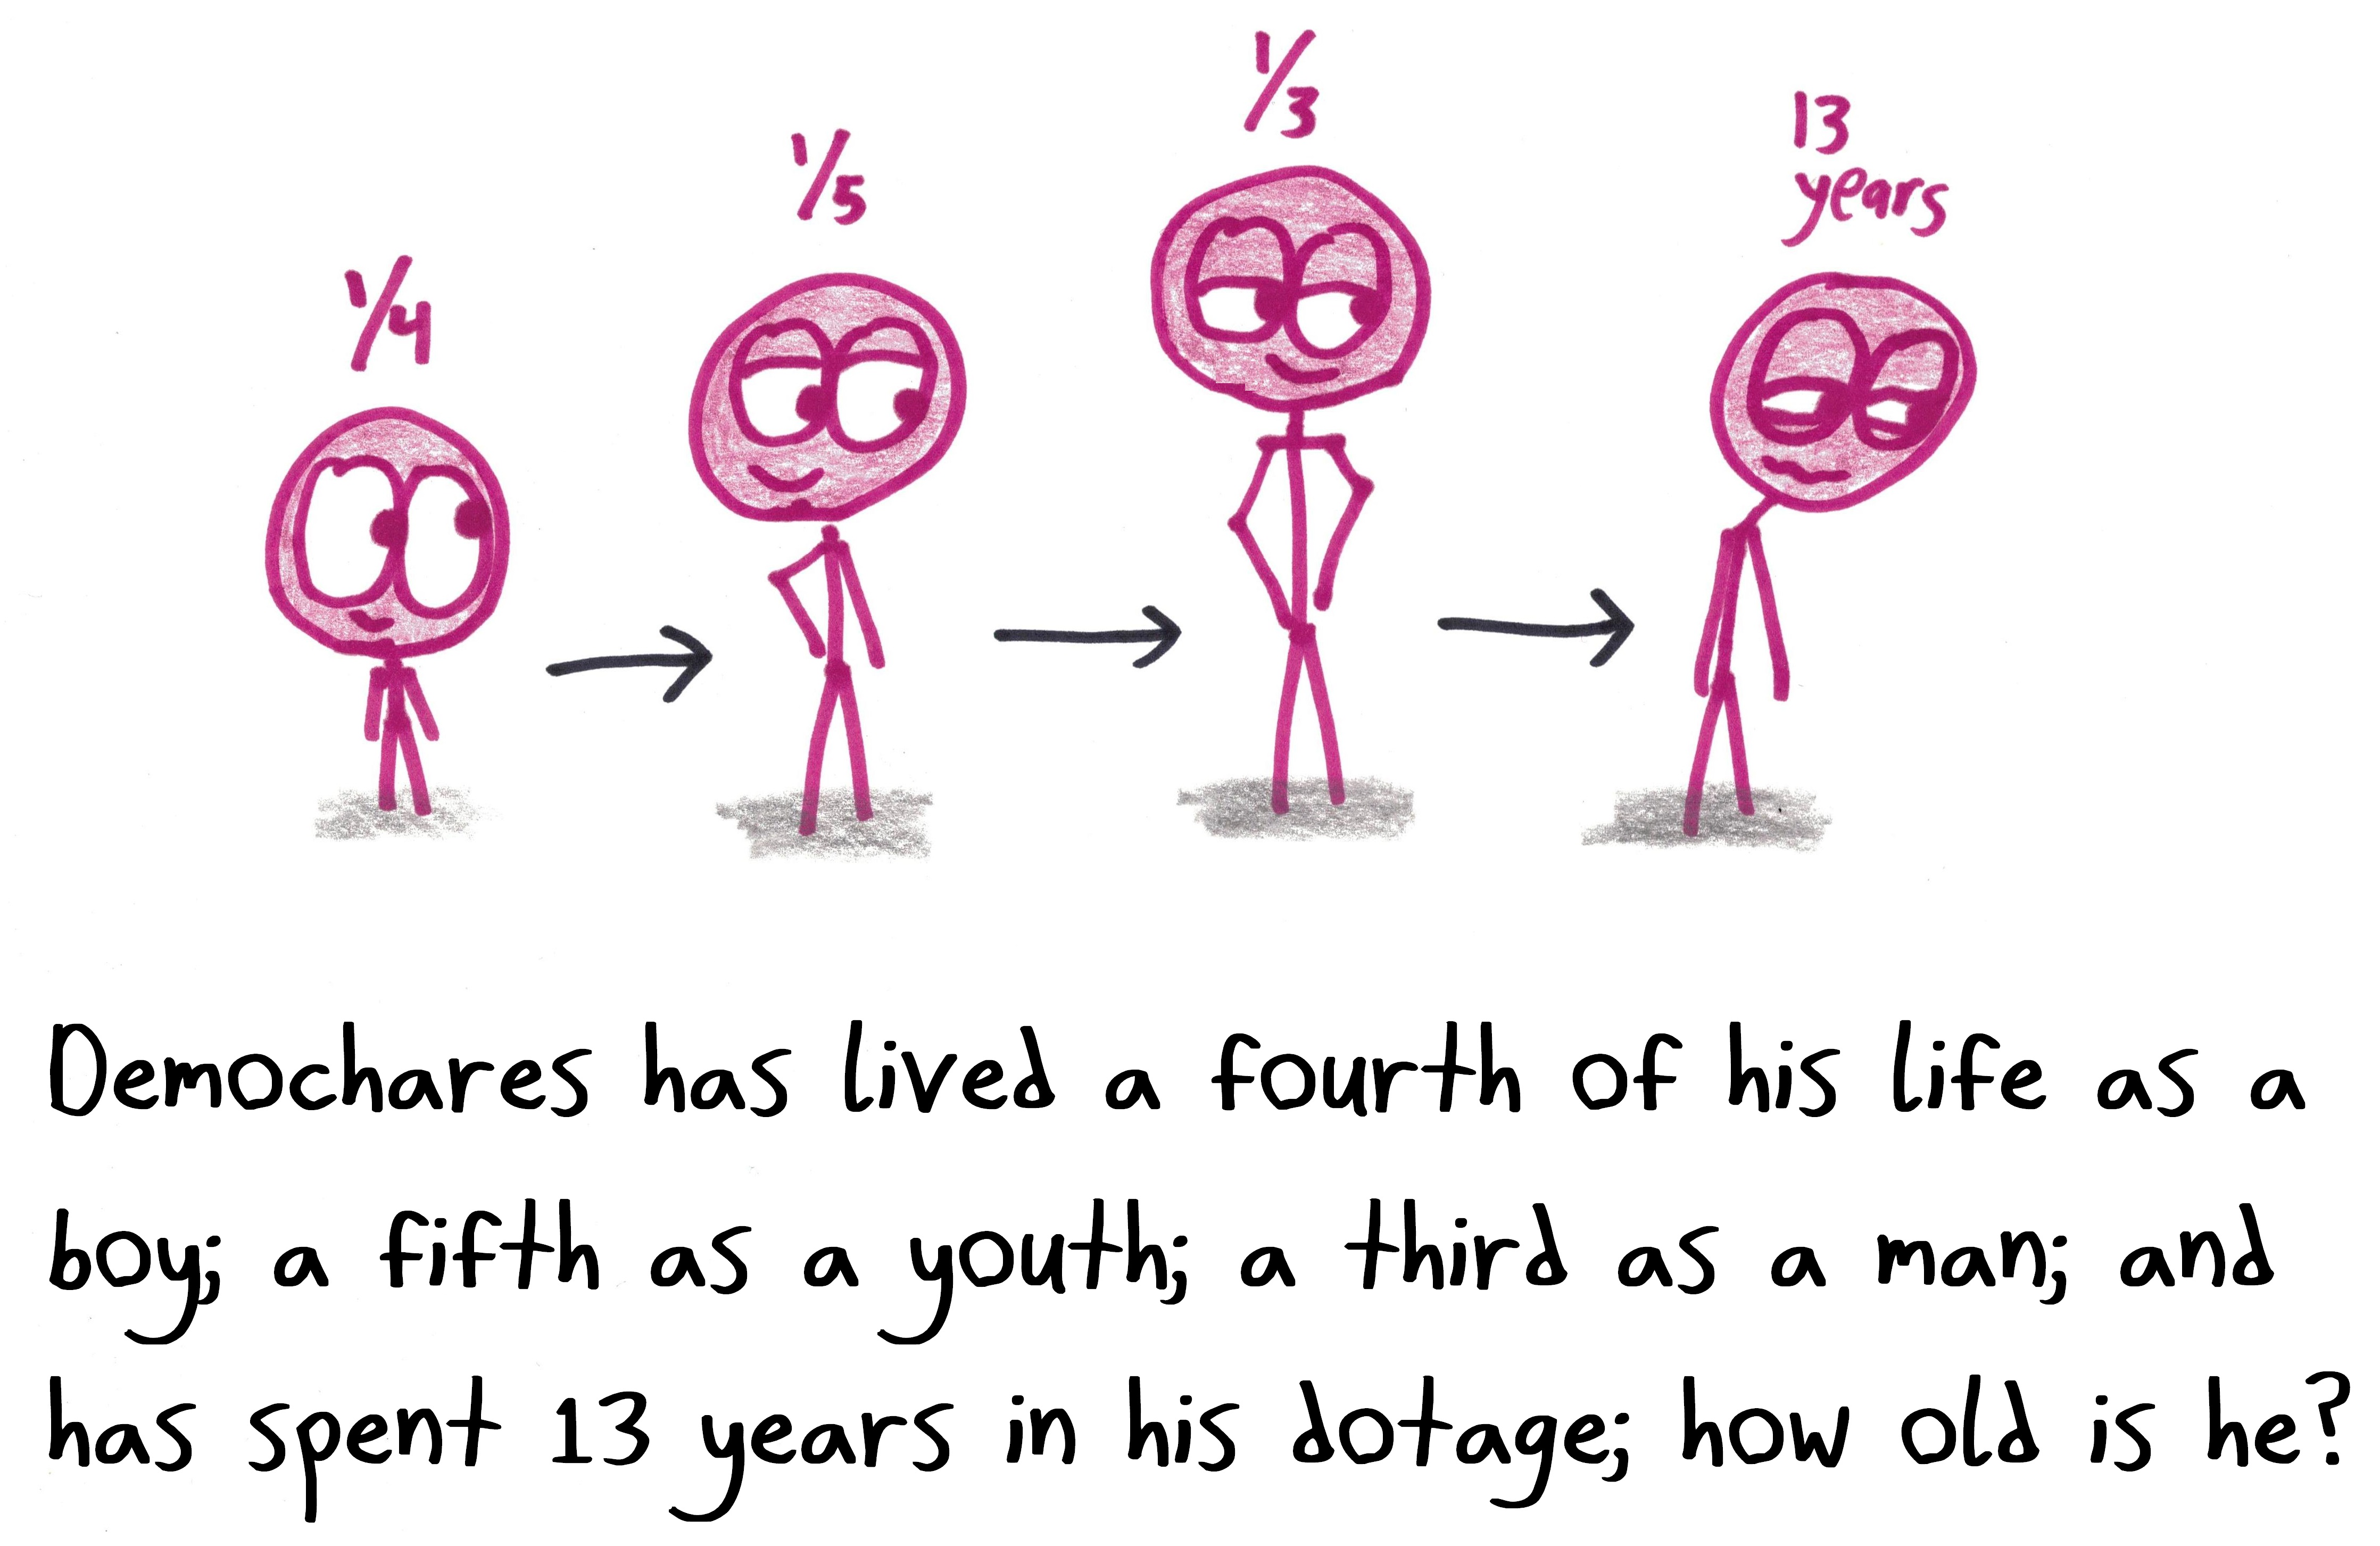 4473x2905 The Third Millennium Of Those My Algebra Problems